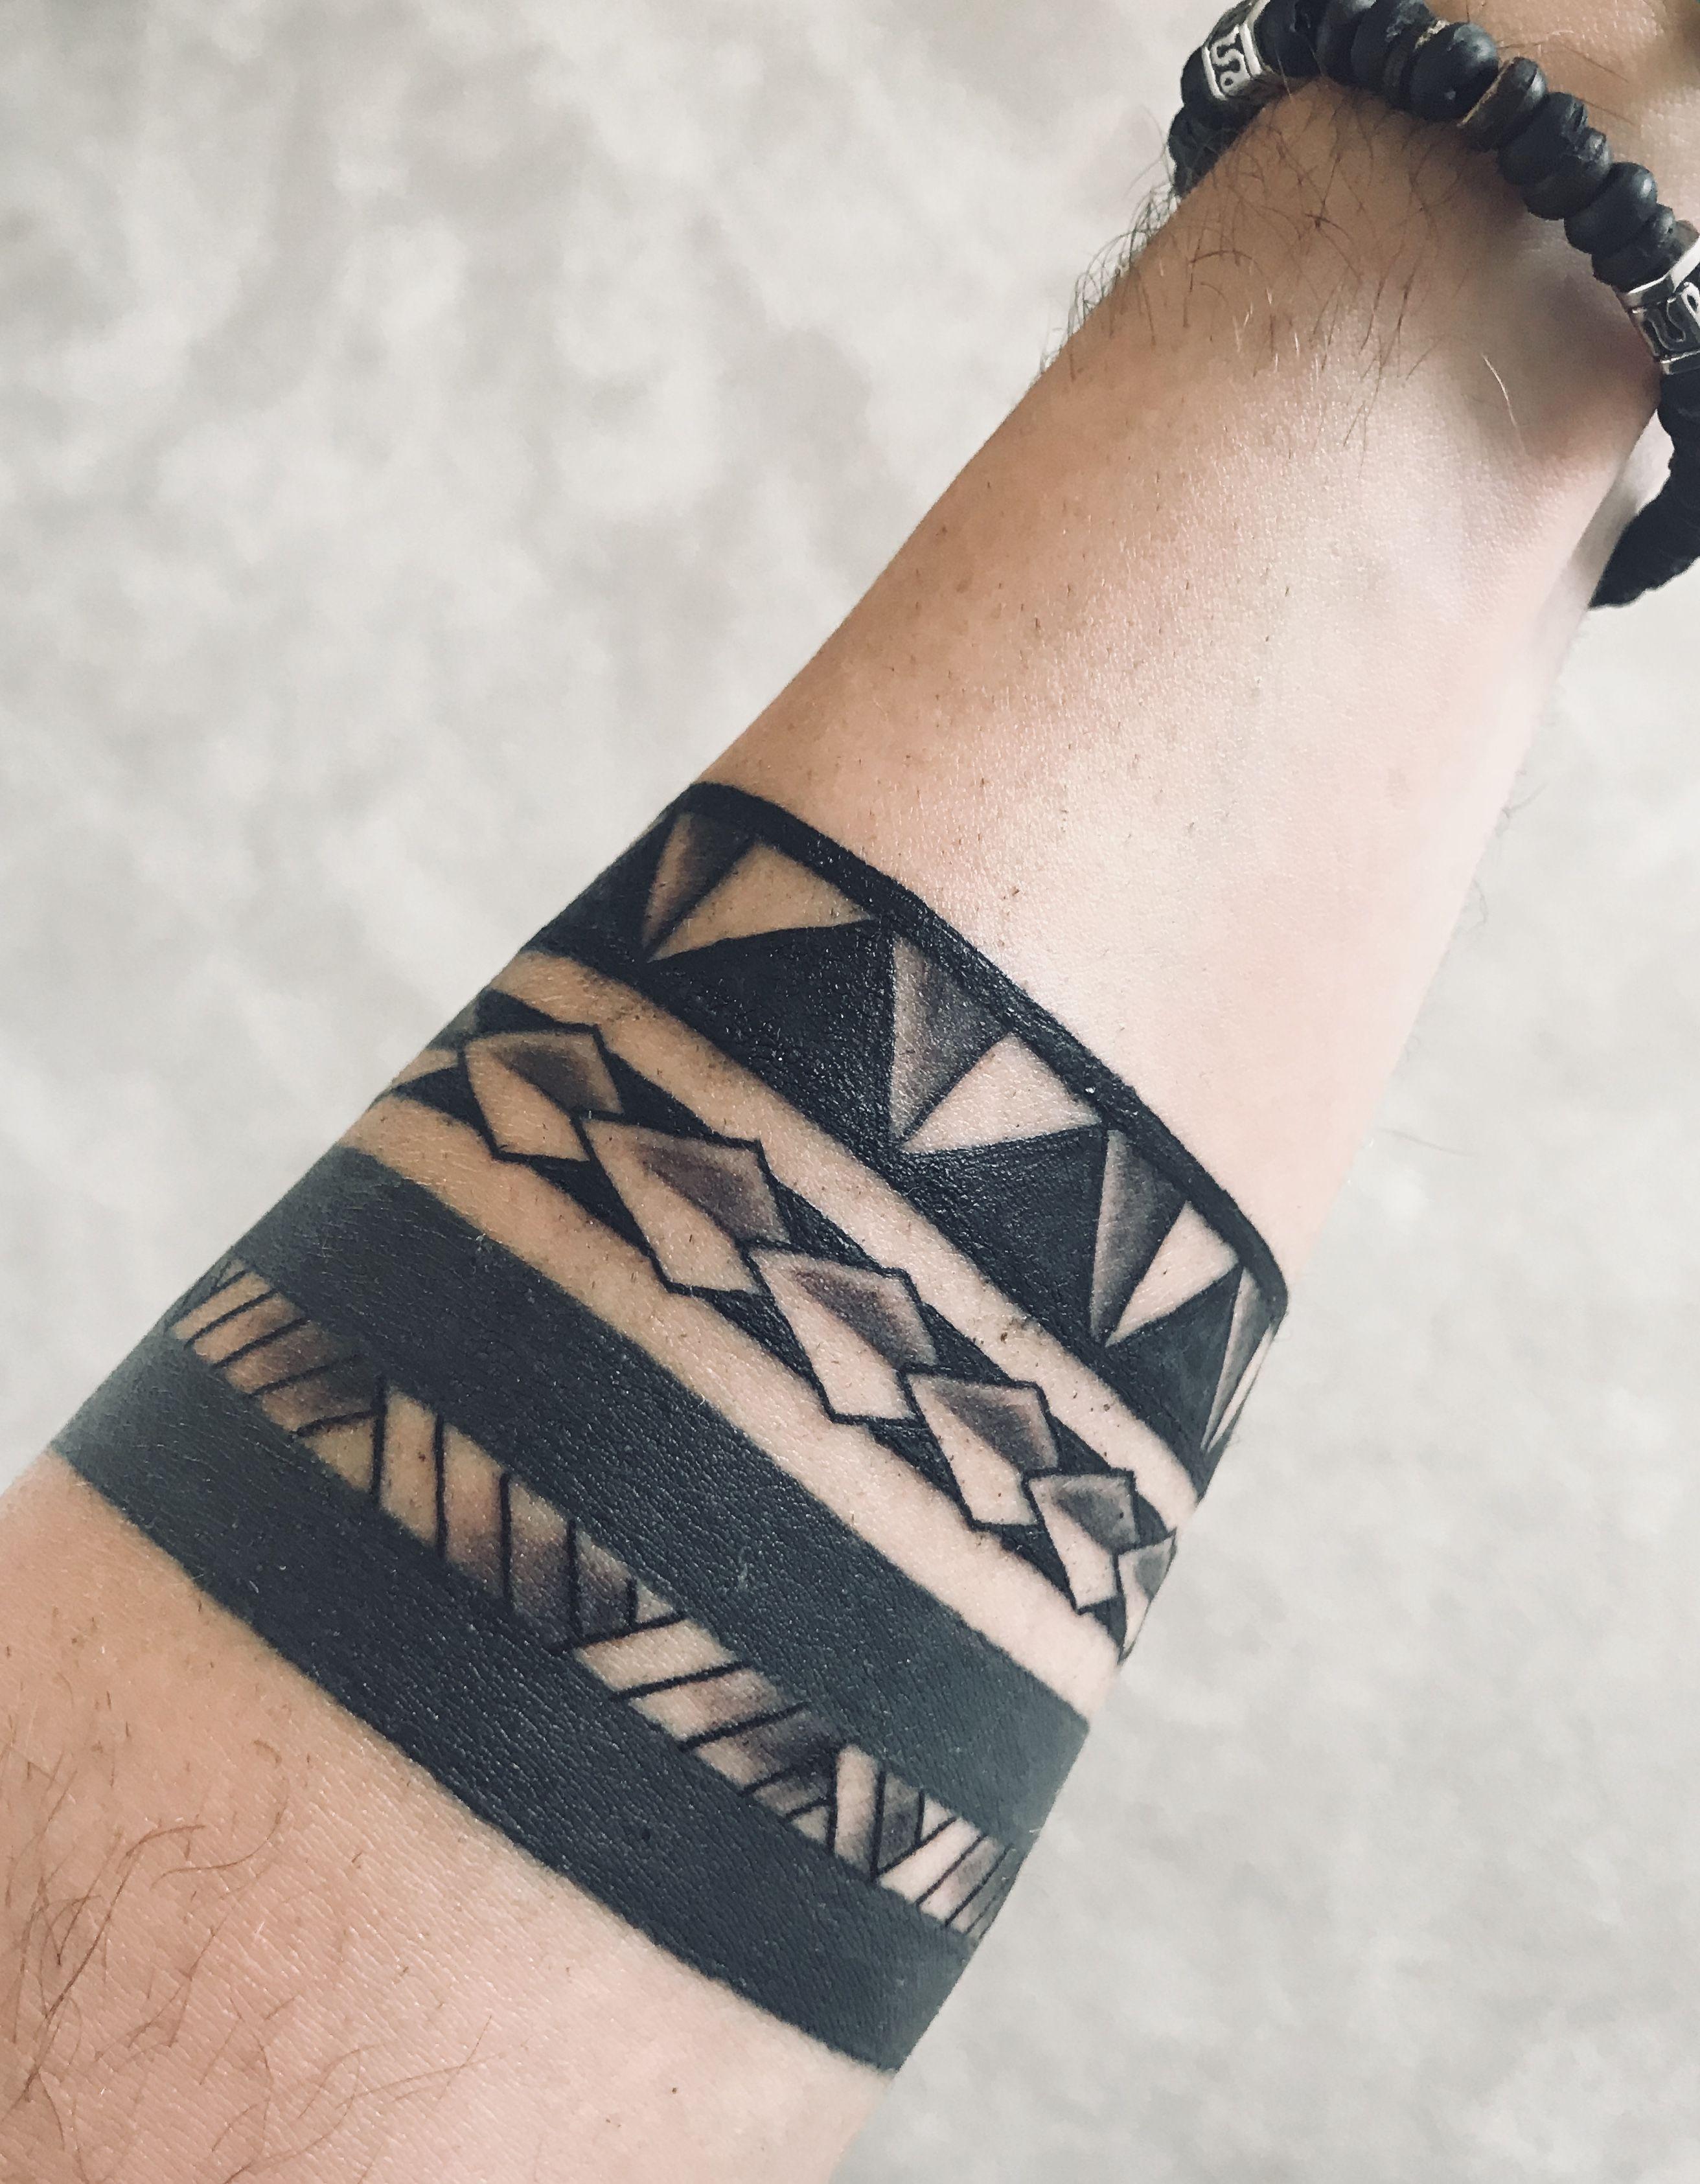 Polynesian Armband Tattoo Stencil : polynesian, armband, tattoo, stencil, Wristband, Maori, Tattoo, Design